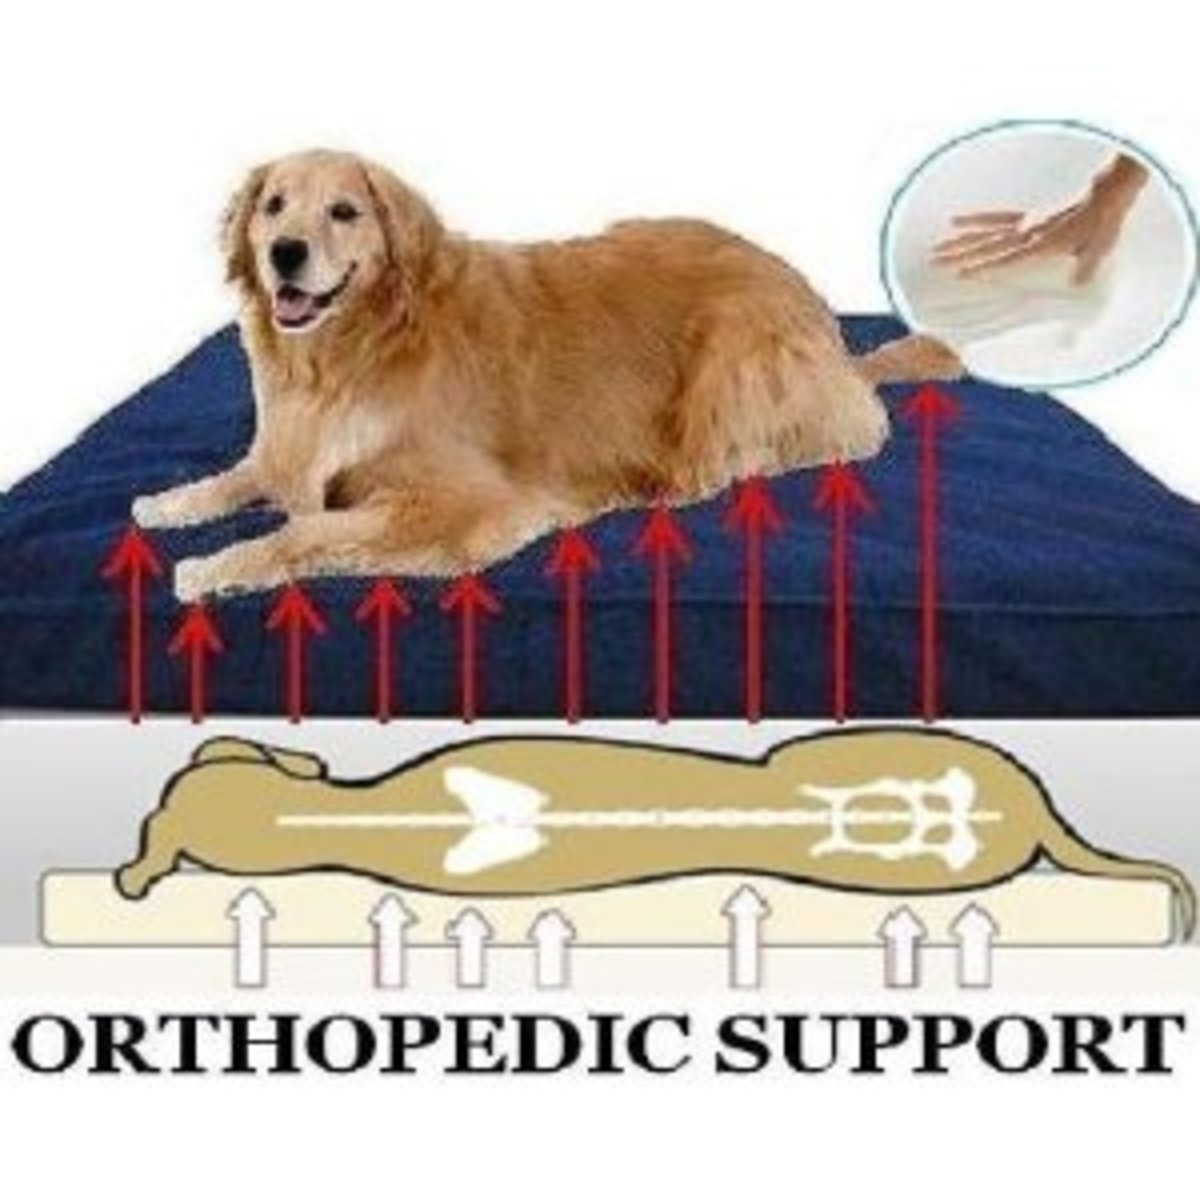 dogbedsforbigdogs